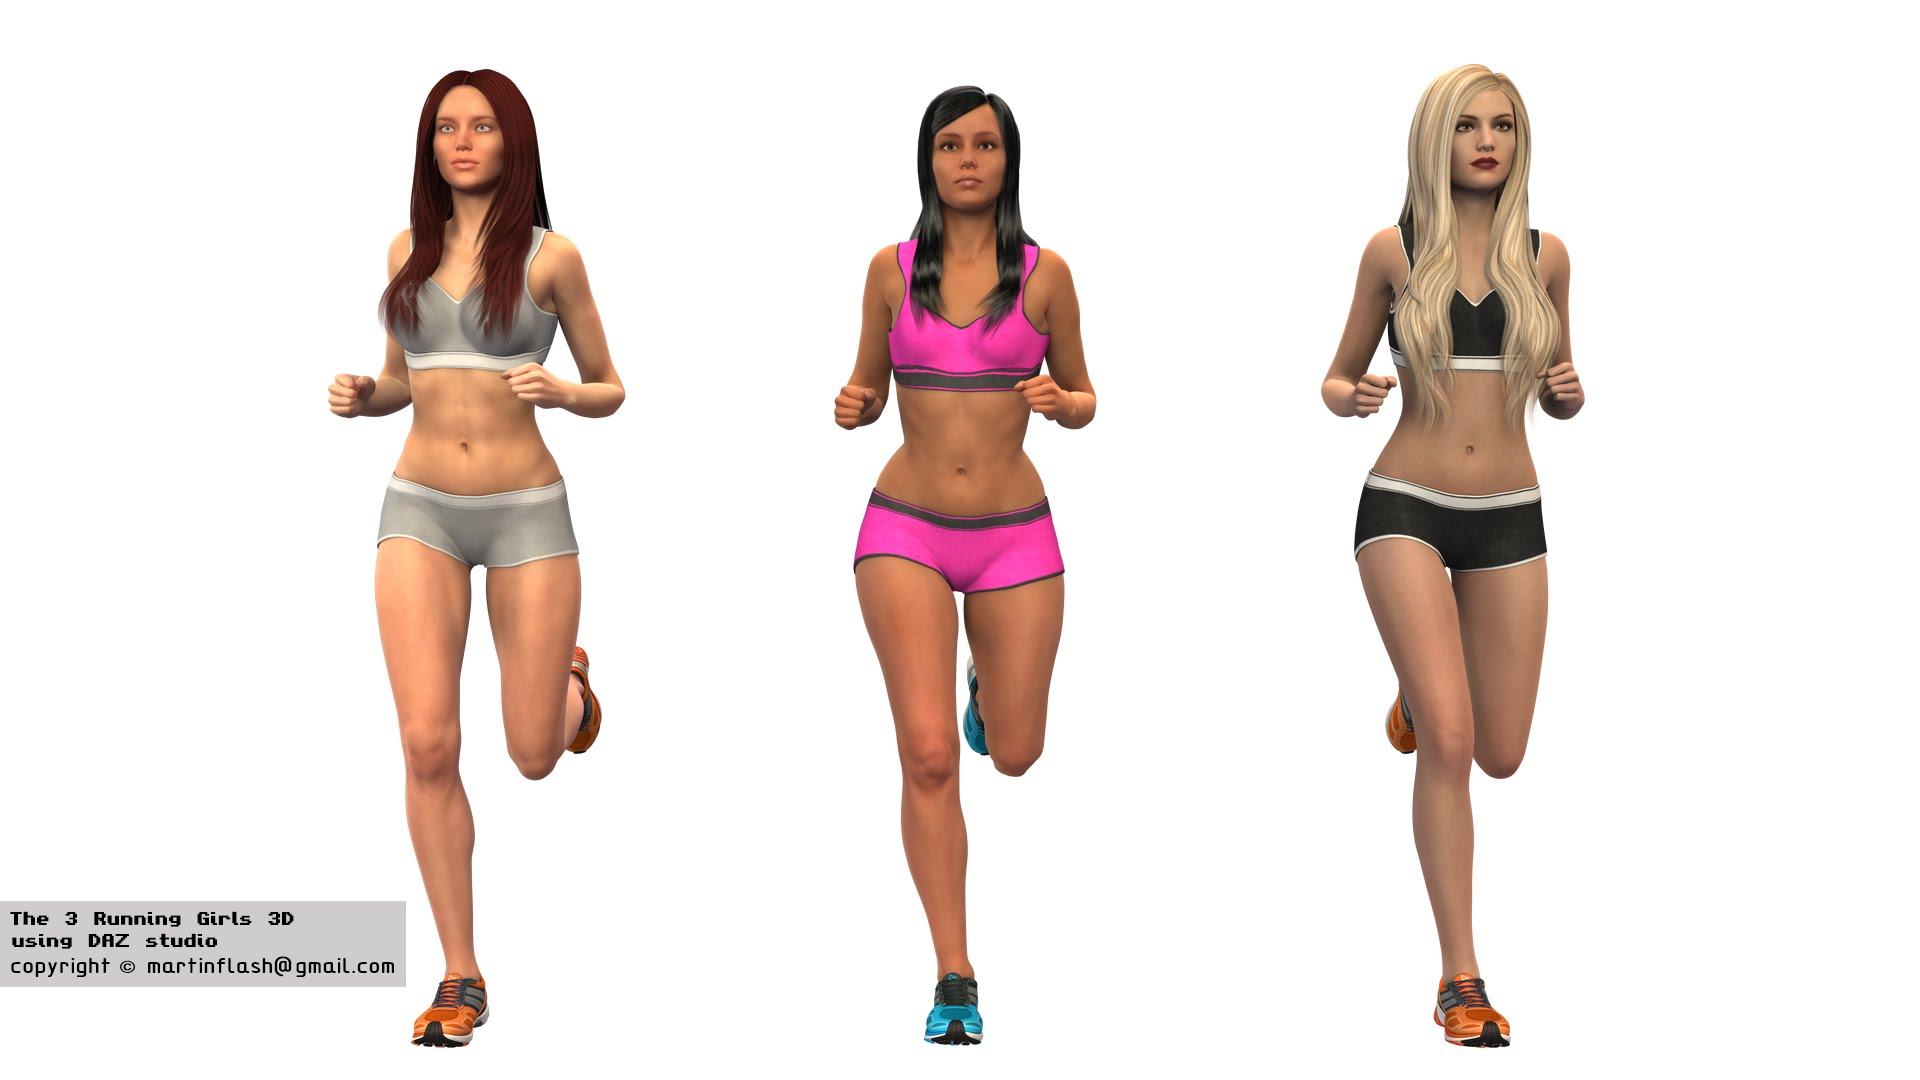 3 running girls 3D rendered in DAZ studio - YouTube